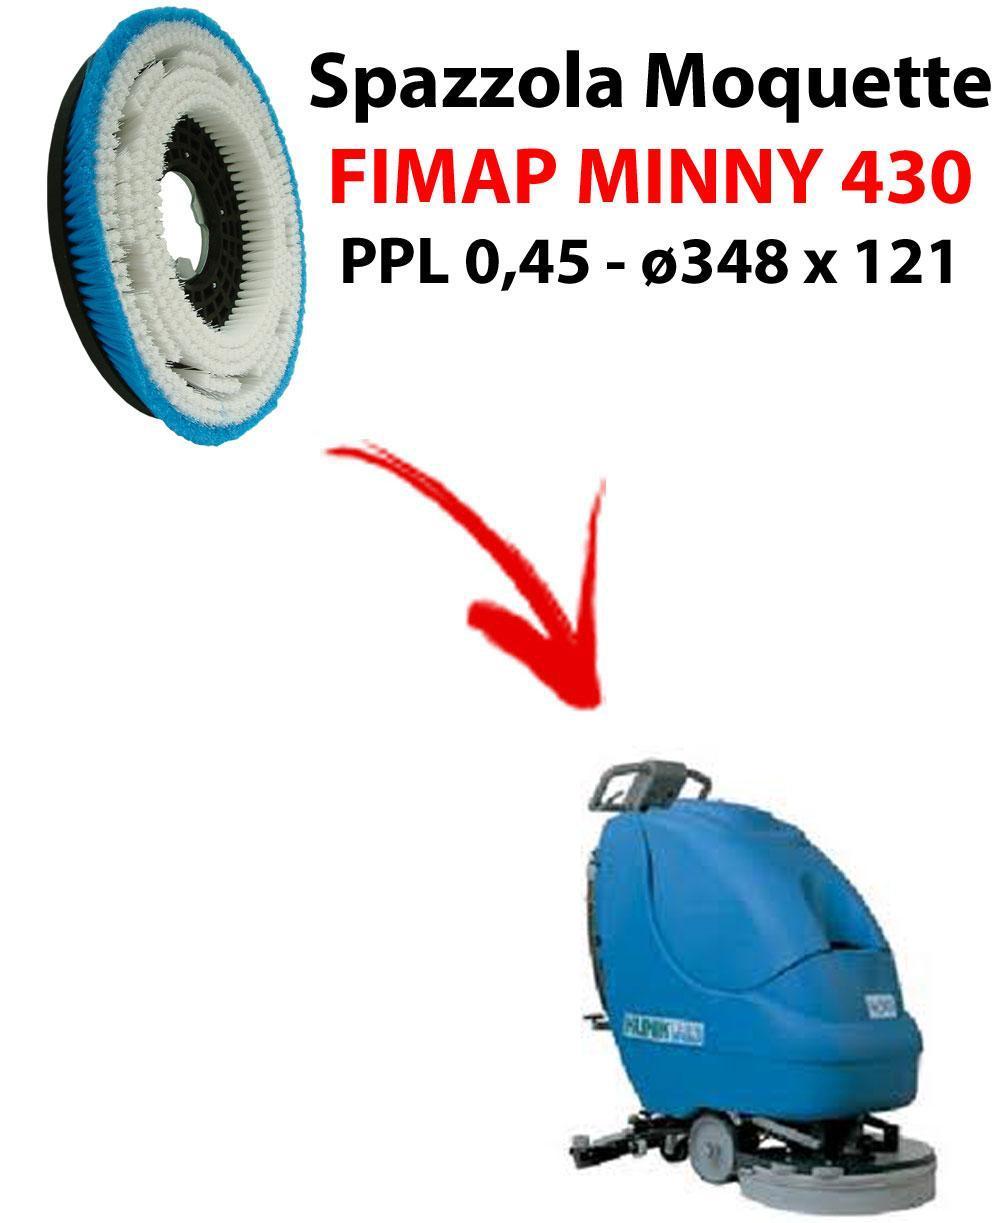 MOQUETTE BRUSH for scrubber dryer FIMAP MINNY 430. Model: PPL 0,45 C/FLANGIA ⌀348 X 121.